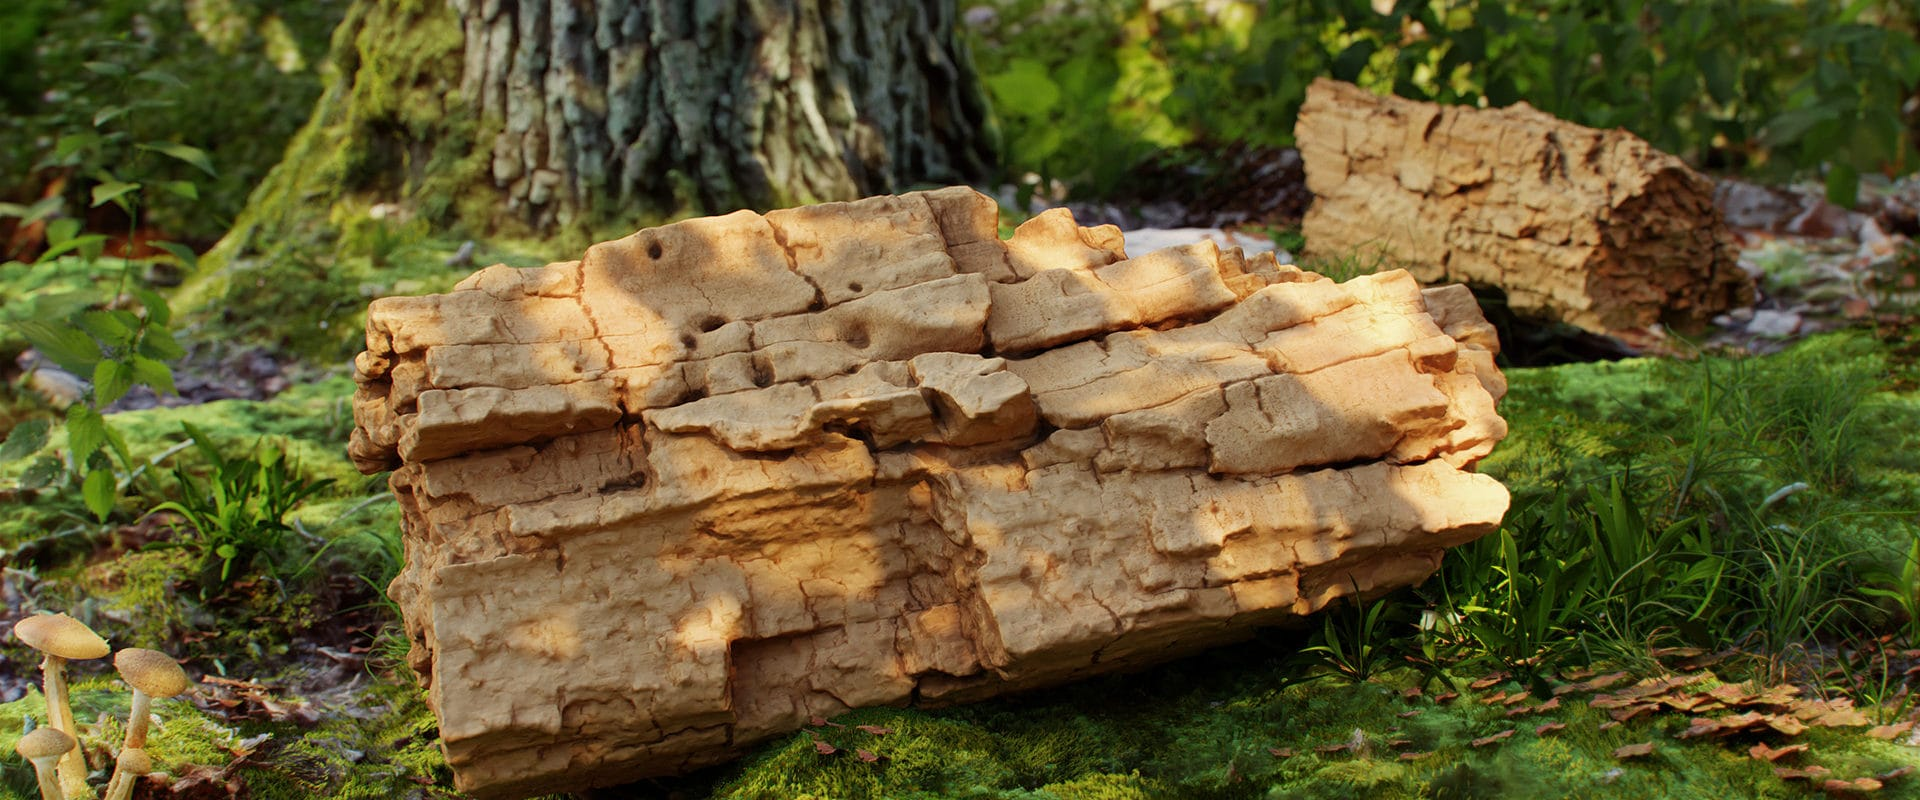 Wood_piece_360_4_27_